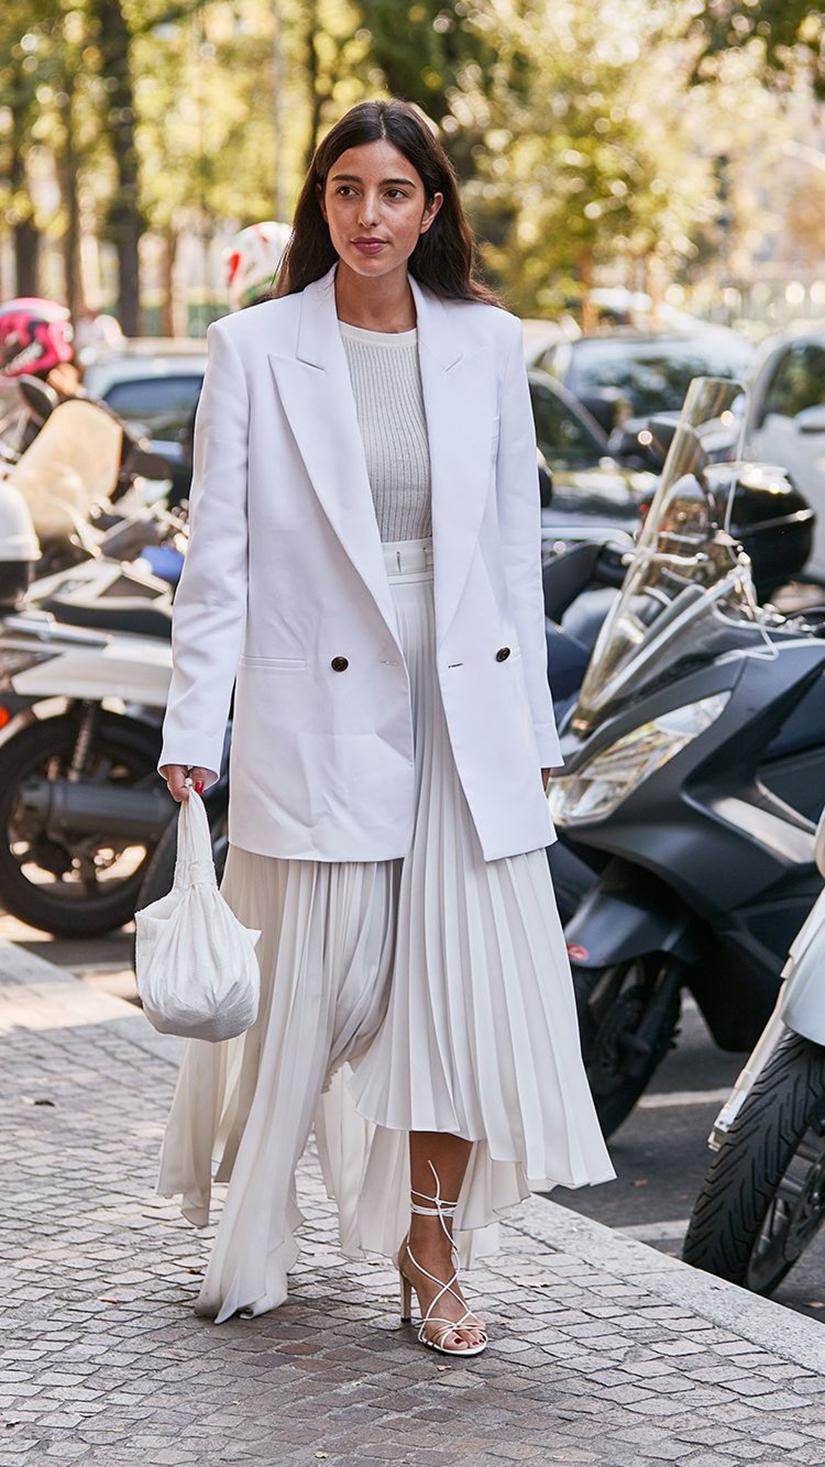 váy xếp ly trắng trang phục monochrome áo blazer